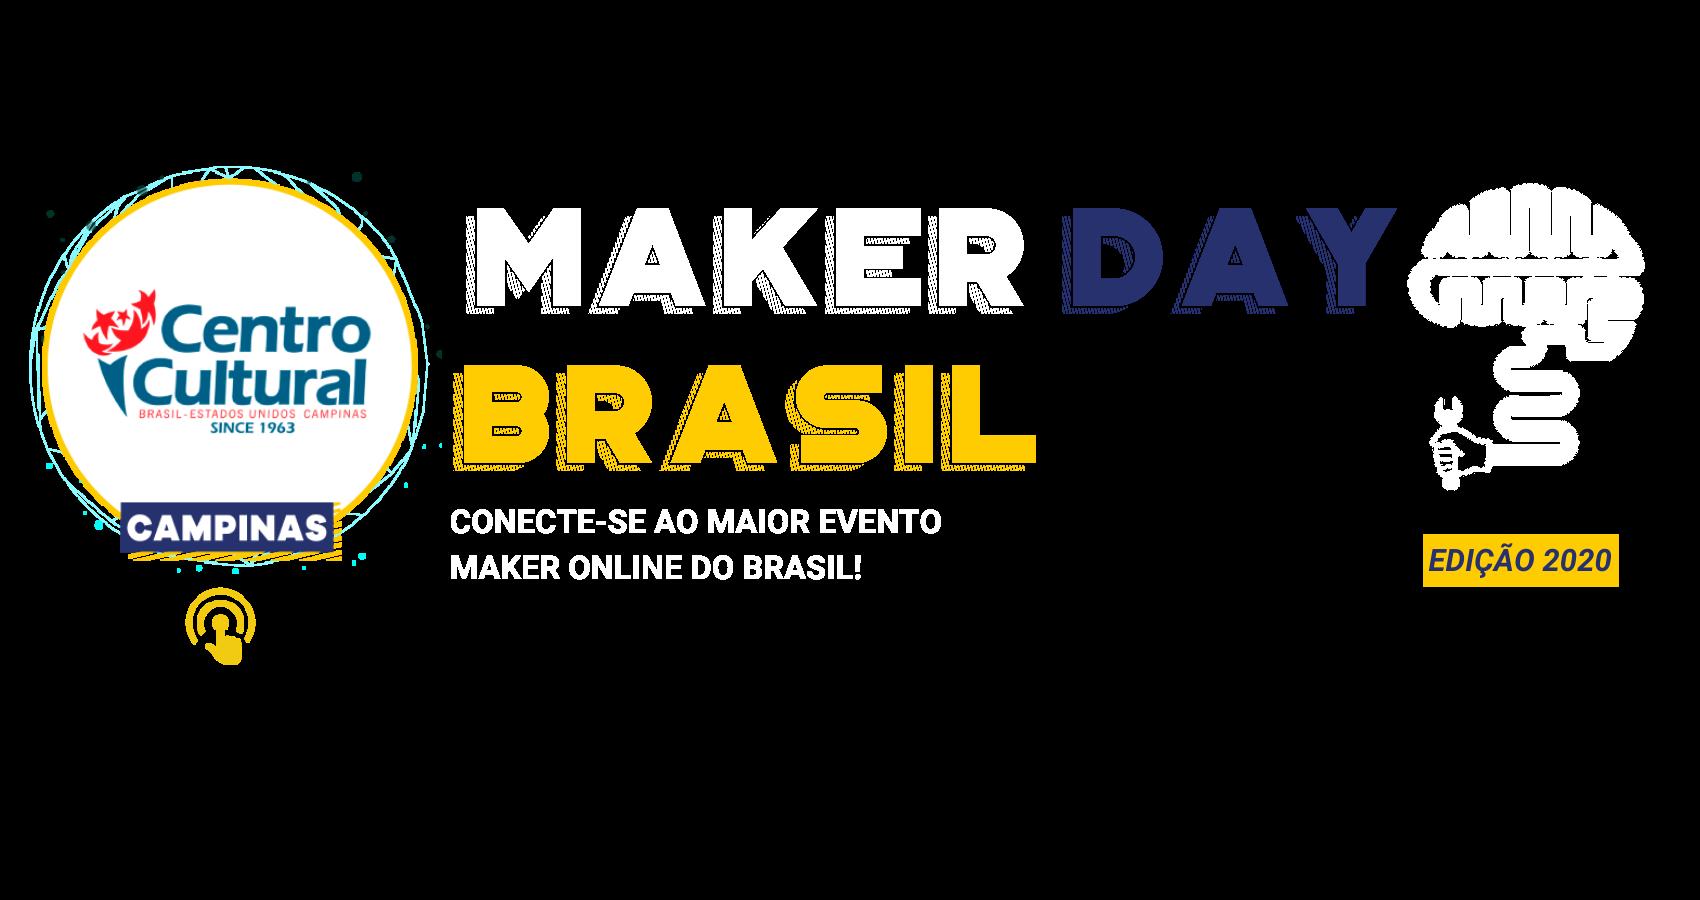 Maker Day Brasil Capa Campinas